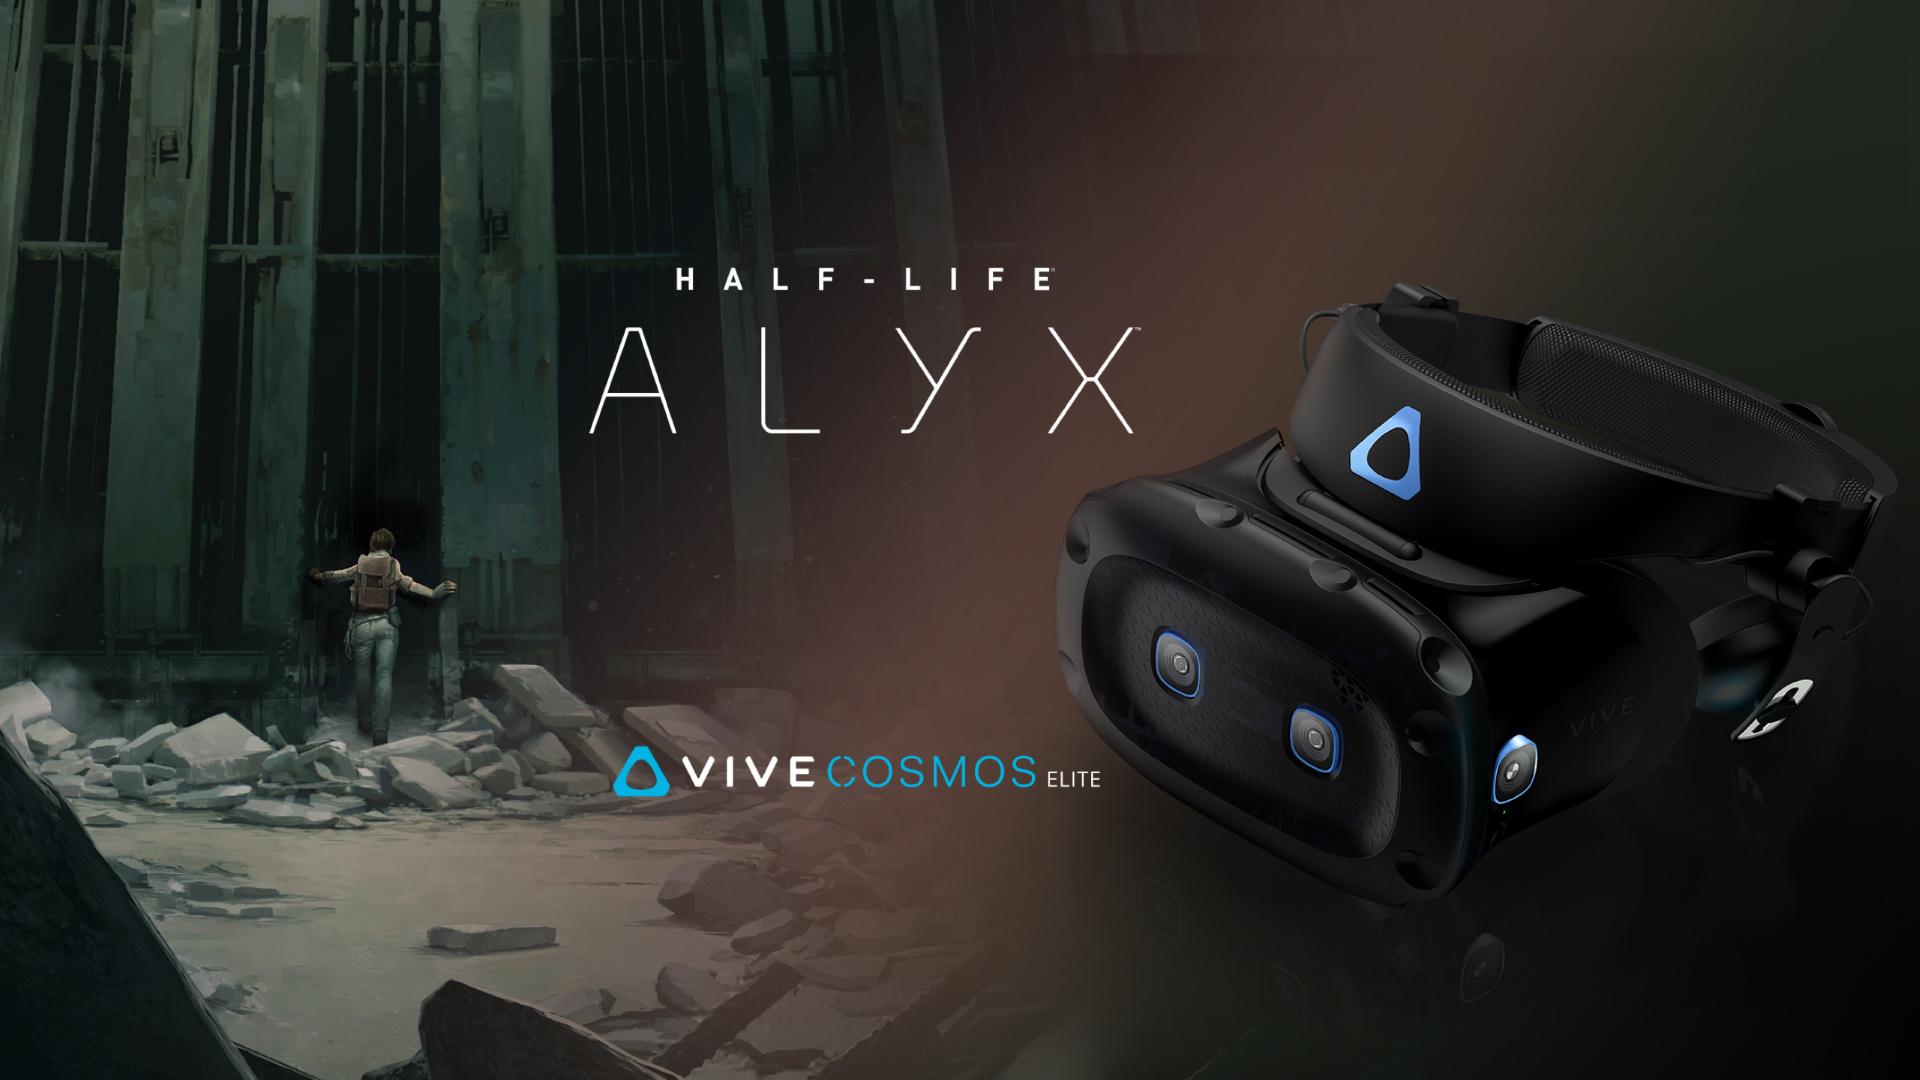 Htc تقدم نظارة Vive Cosmos Elite مع نسخة مجانية من Half Life Alyx Htc تقدم نظارة Vive Cosmos Elite مع نسخة مجانية من Htc Vive Half Life Virtual Reality Games